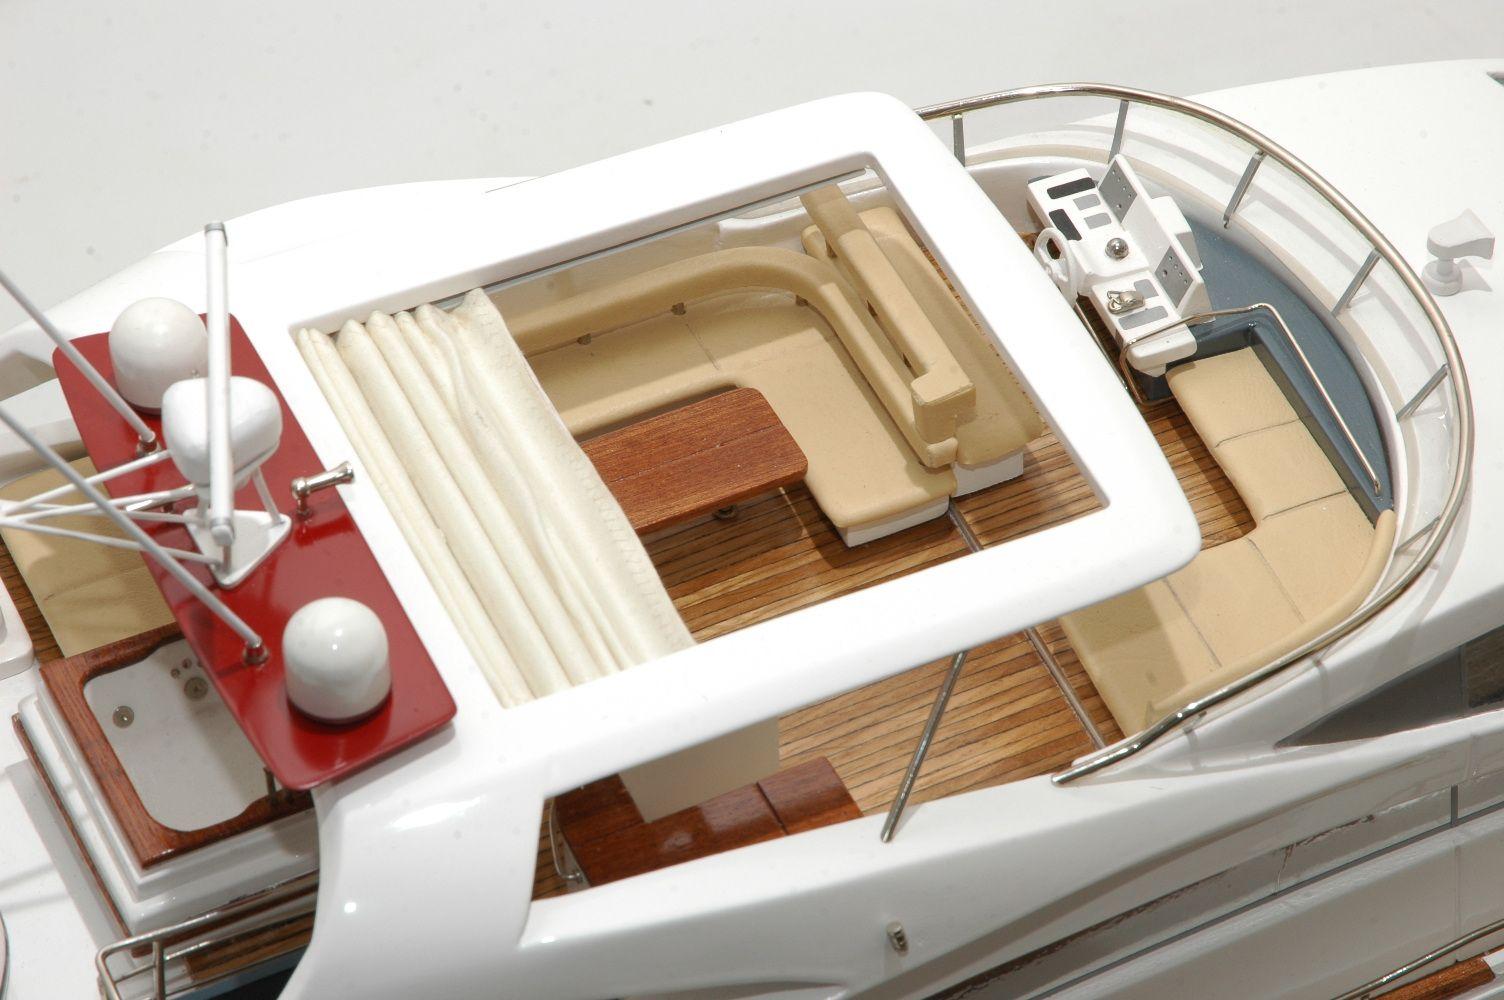 1333-6877-Aicon-Fly-85-Yacht-Premier-Range